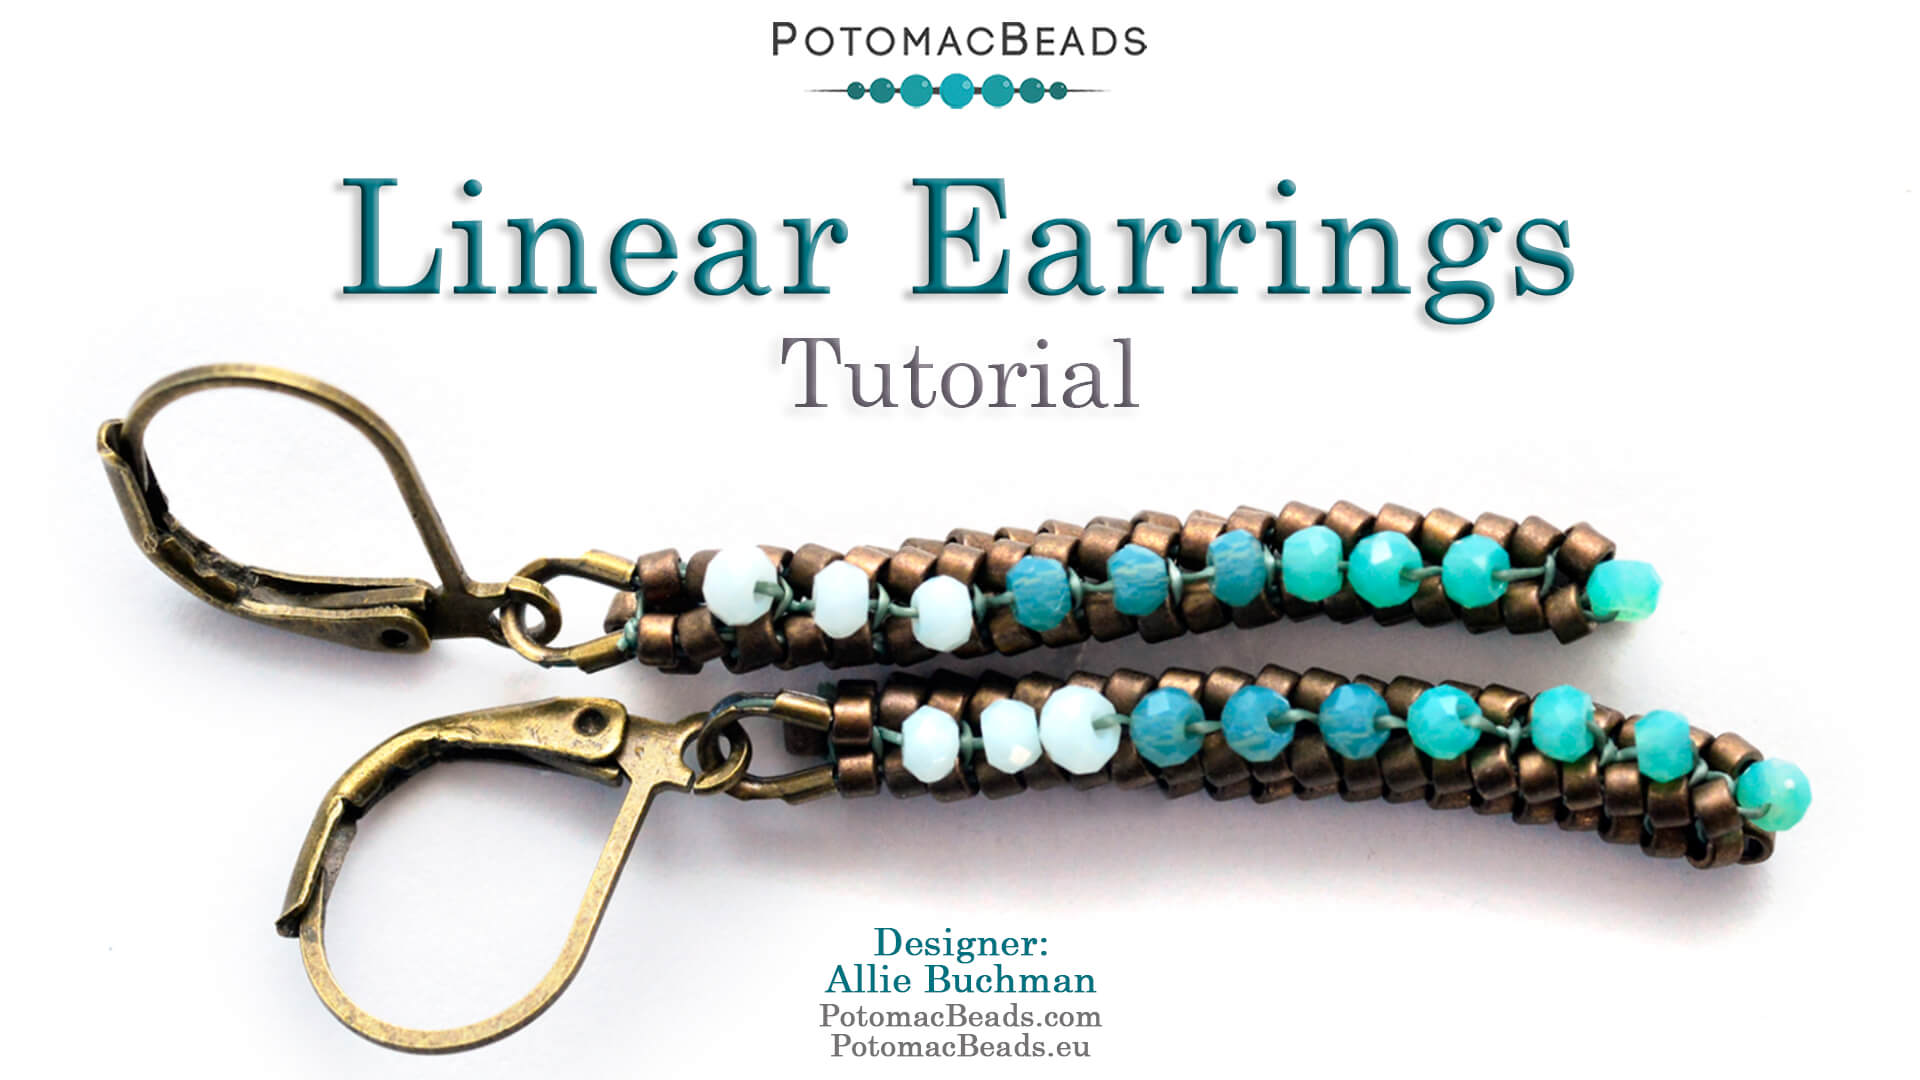 How to Bead Jewelry / Beading Tutorials & Jewel Making Videos / Tubular Herringbone Videos / Linear Earrings Tutorial